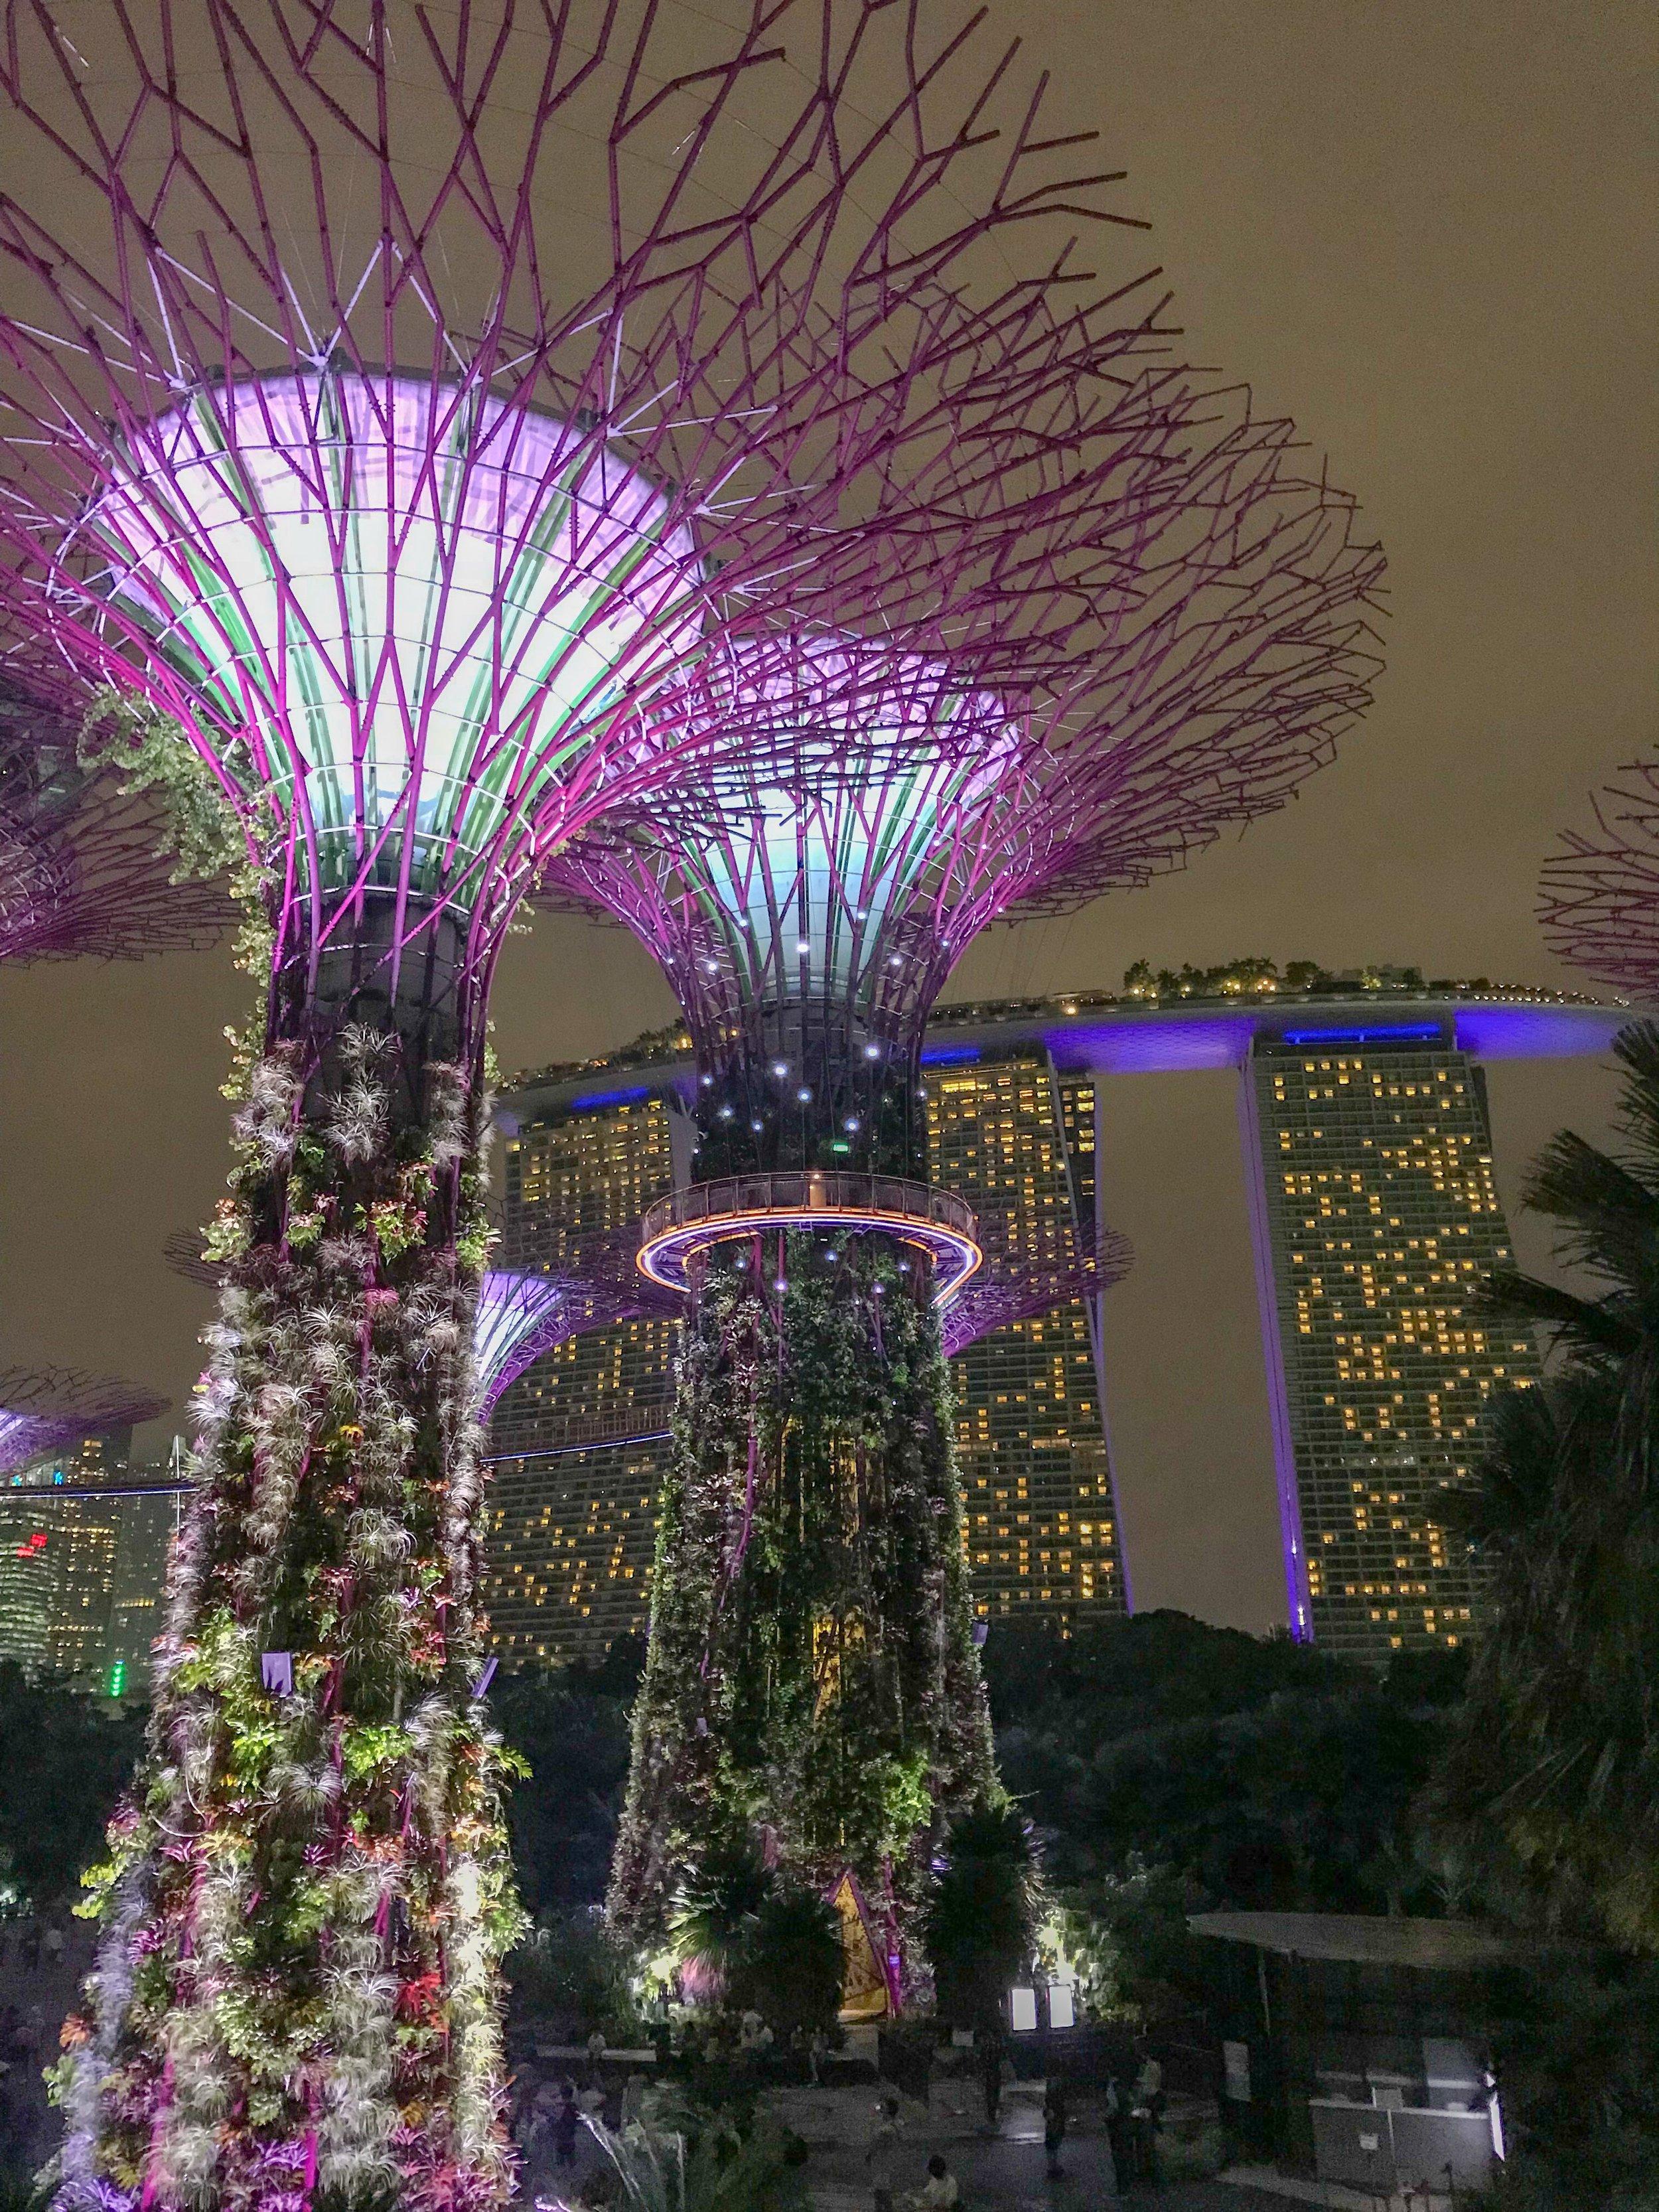 Gardens By the Bay & Marina Bay Sands Hotel